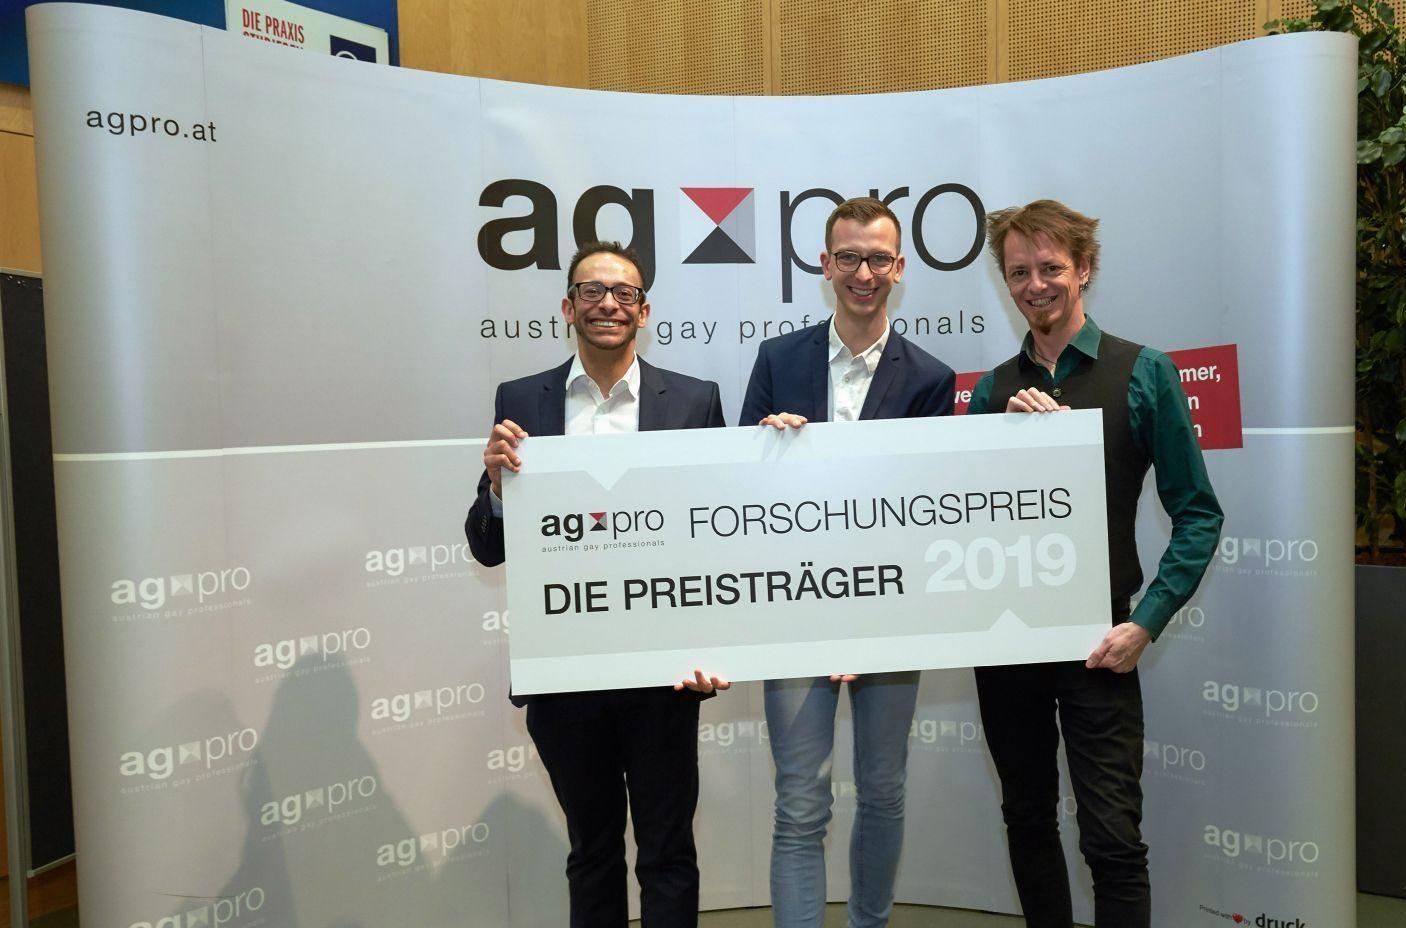 pridebiz_verleihung 11. Forschungspreis